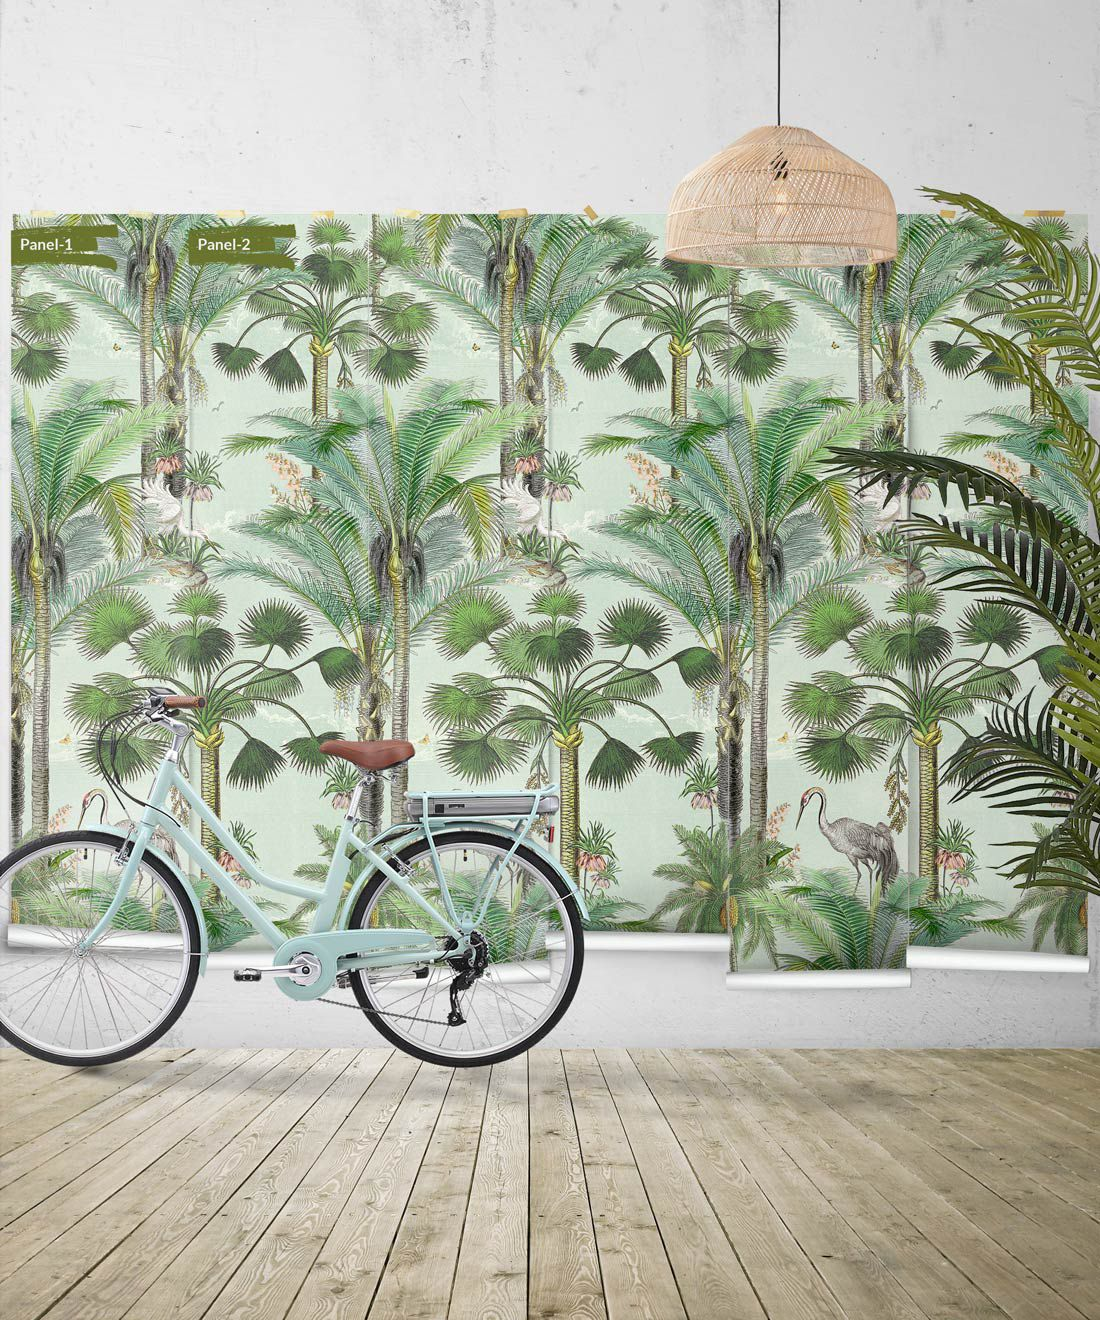 Kerala Palms Wallpaper Mural •Bethany Linz • Palm Tree Mural • Blue • Panels